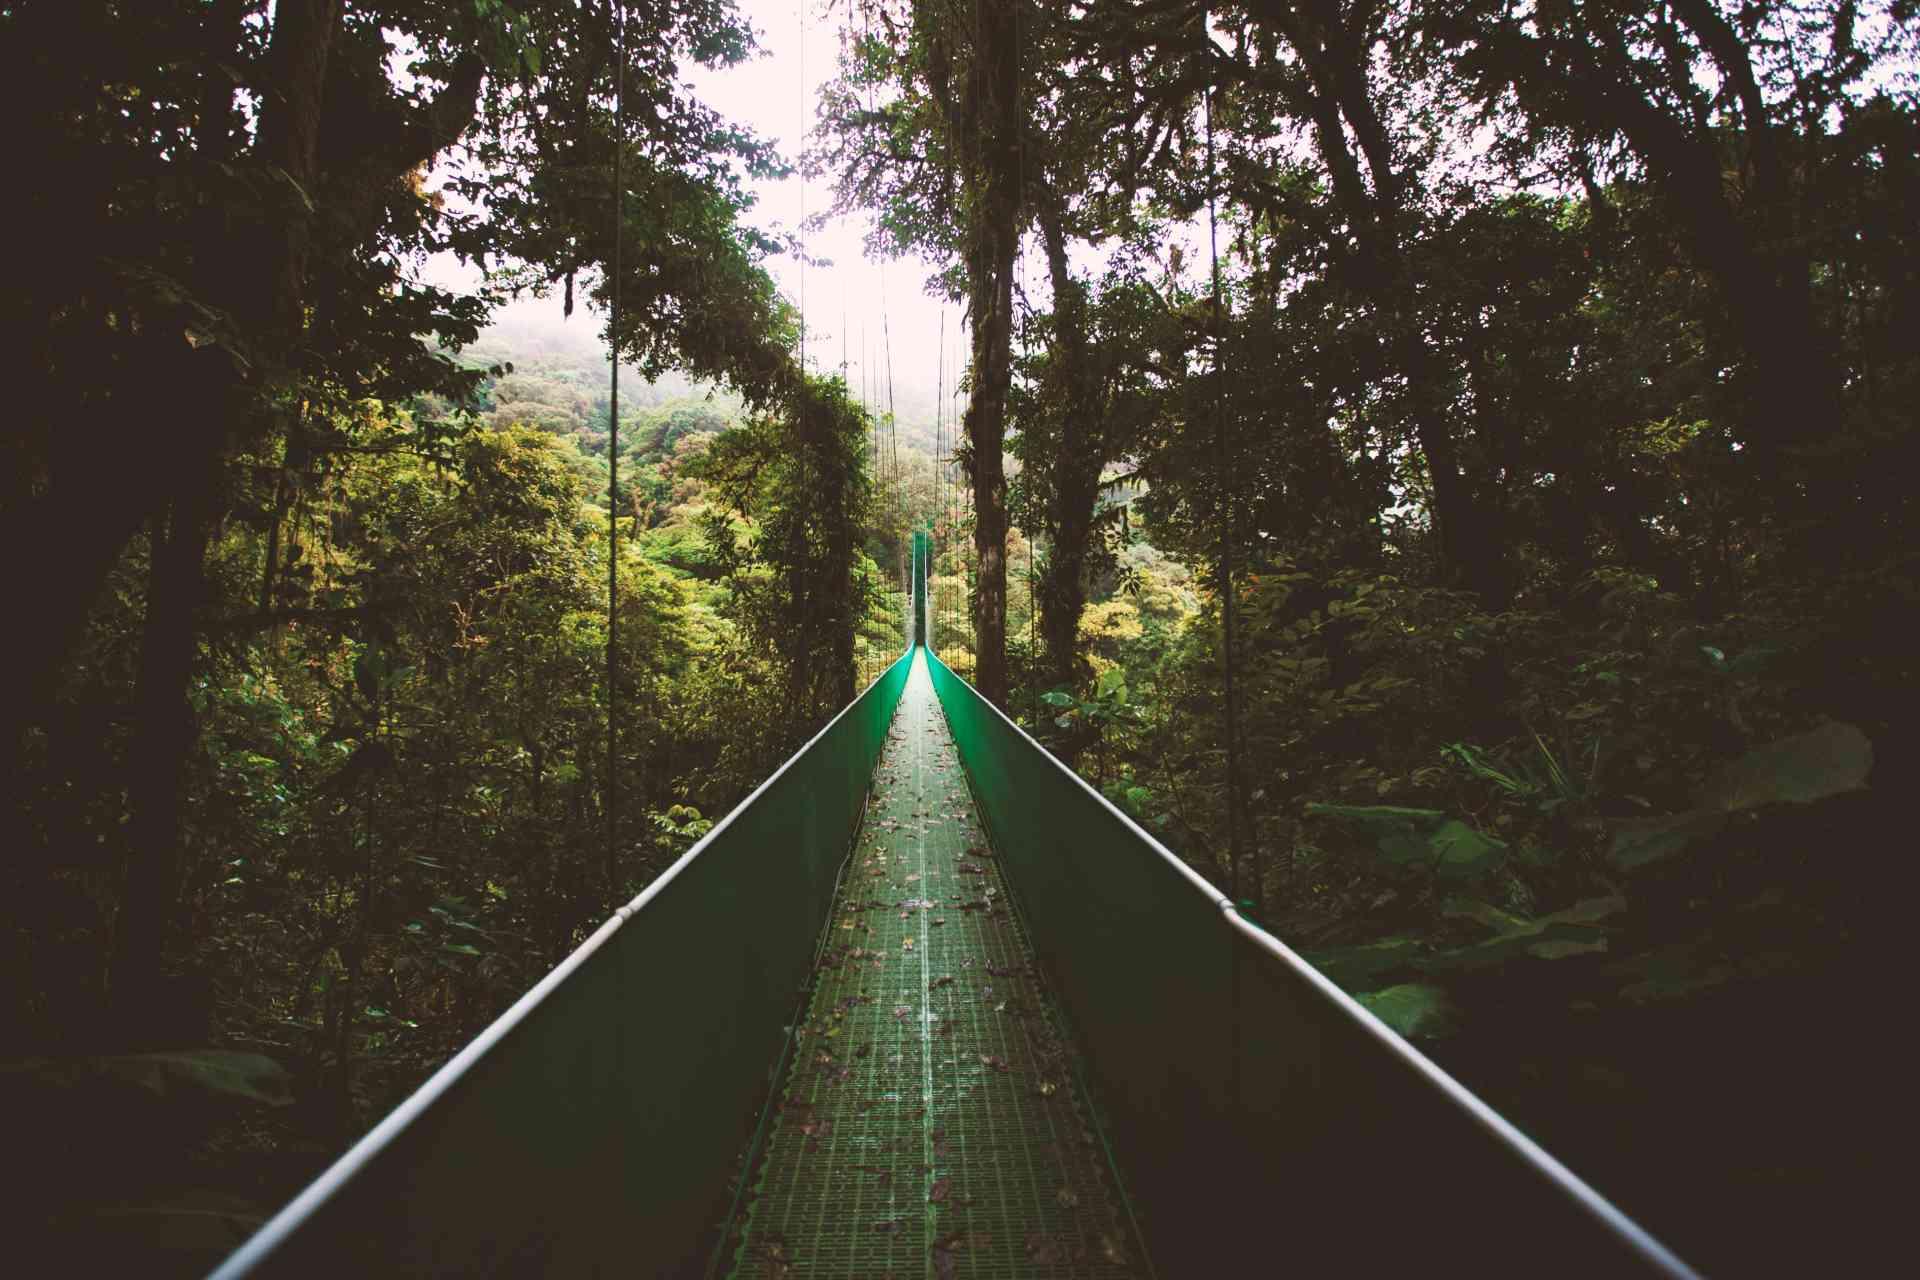 Selvatura cloud forest, Monteverde, Costa Rica by Ben Ostrower/Unsplash